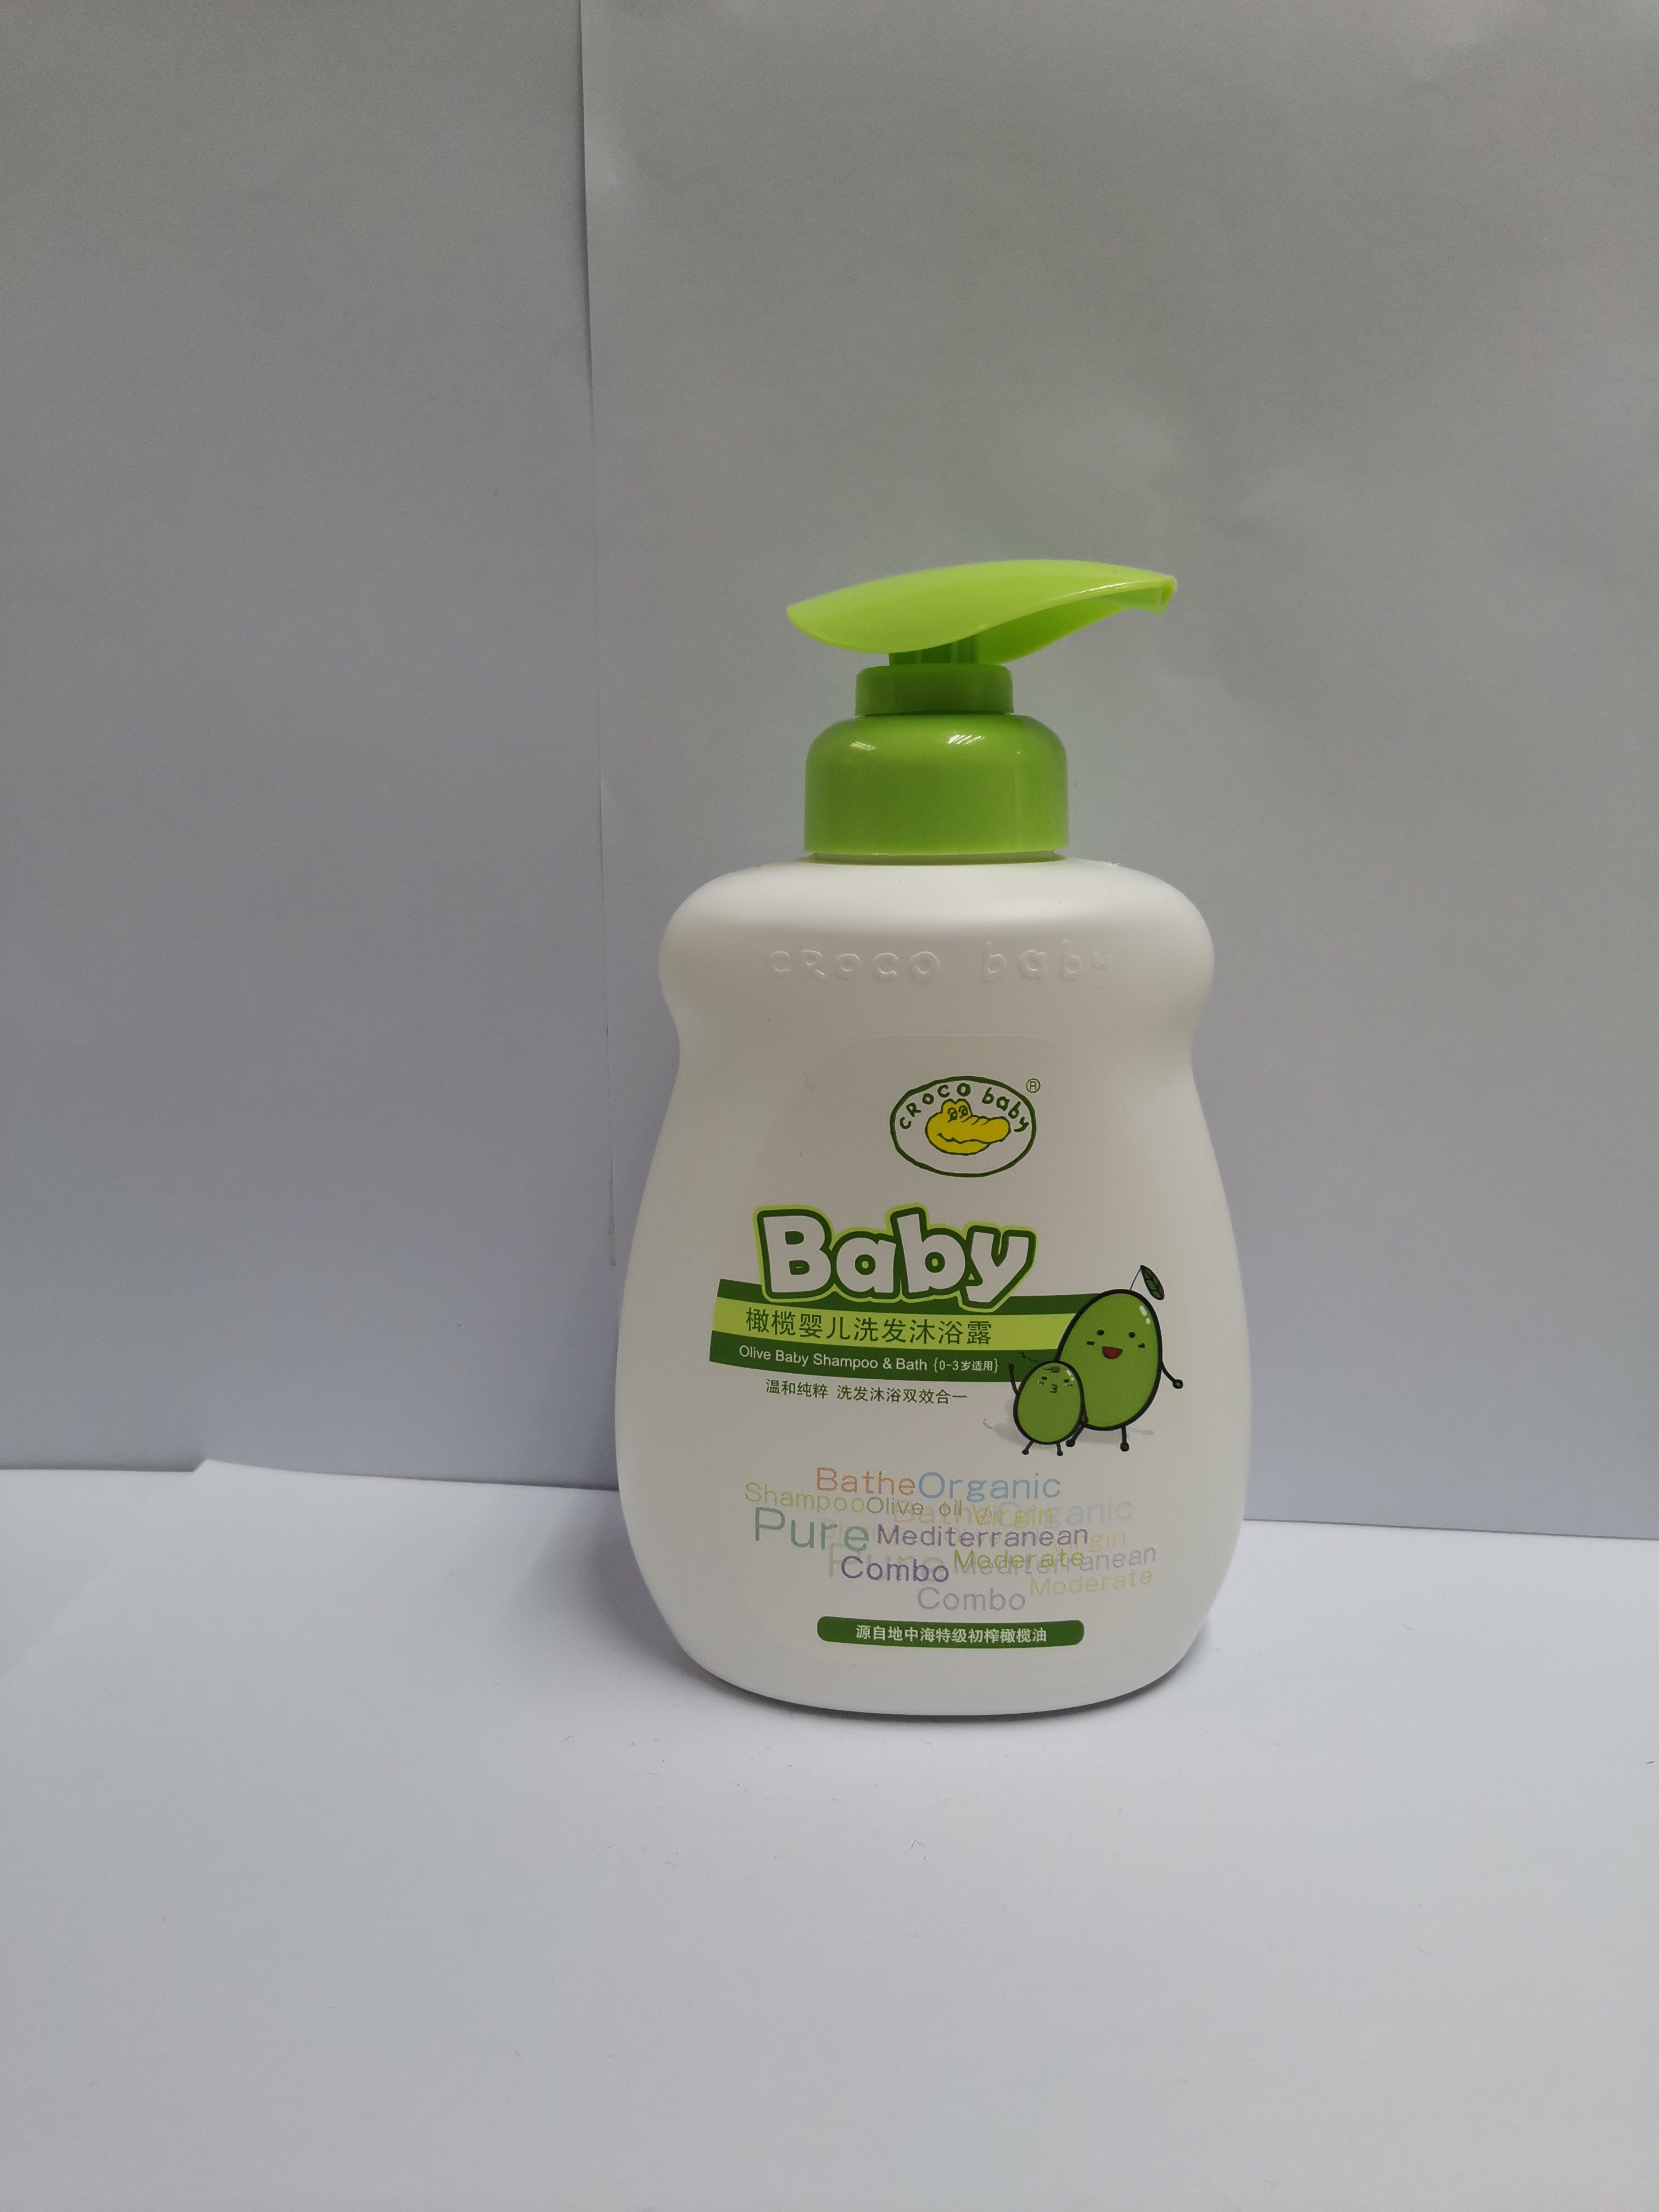 650g橄榄婴儿洗发沐浴露-正面.jpg